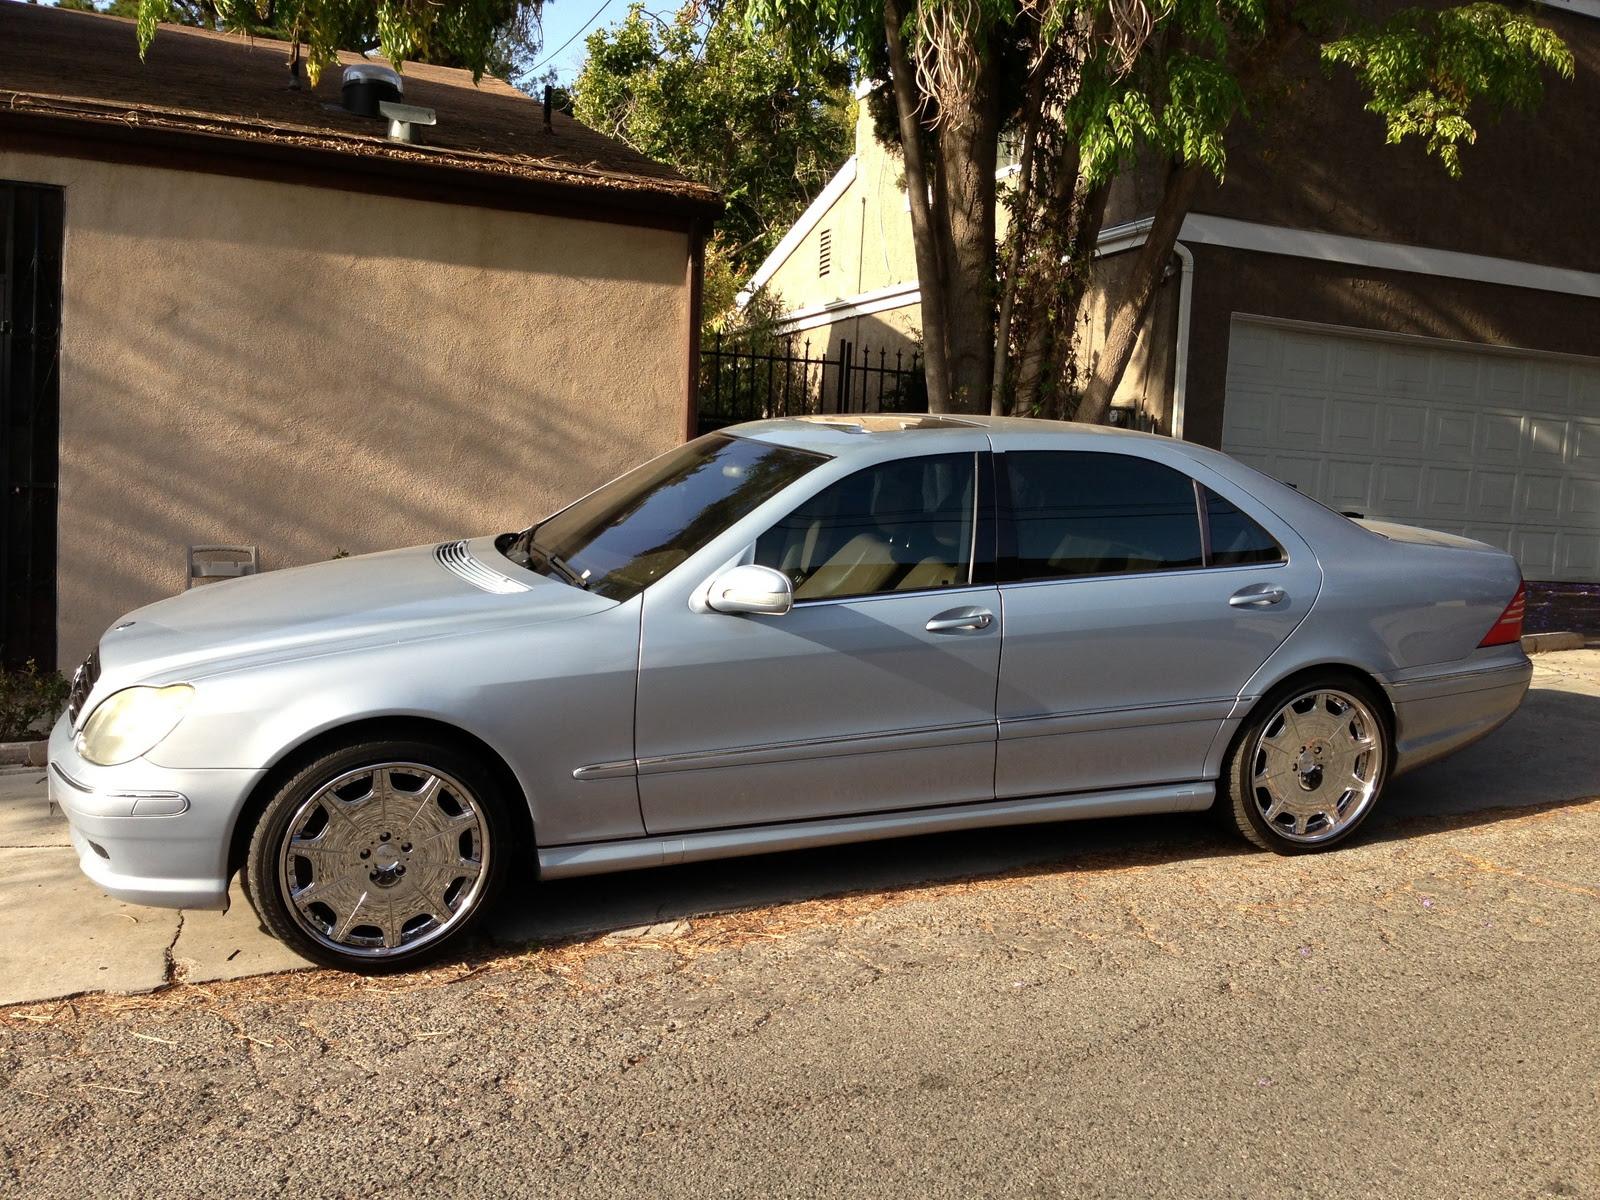 2001 Mercedes-Benz S-Class - Pictures - CarGurus